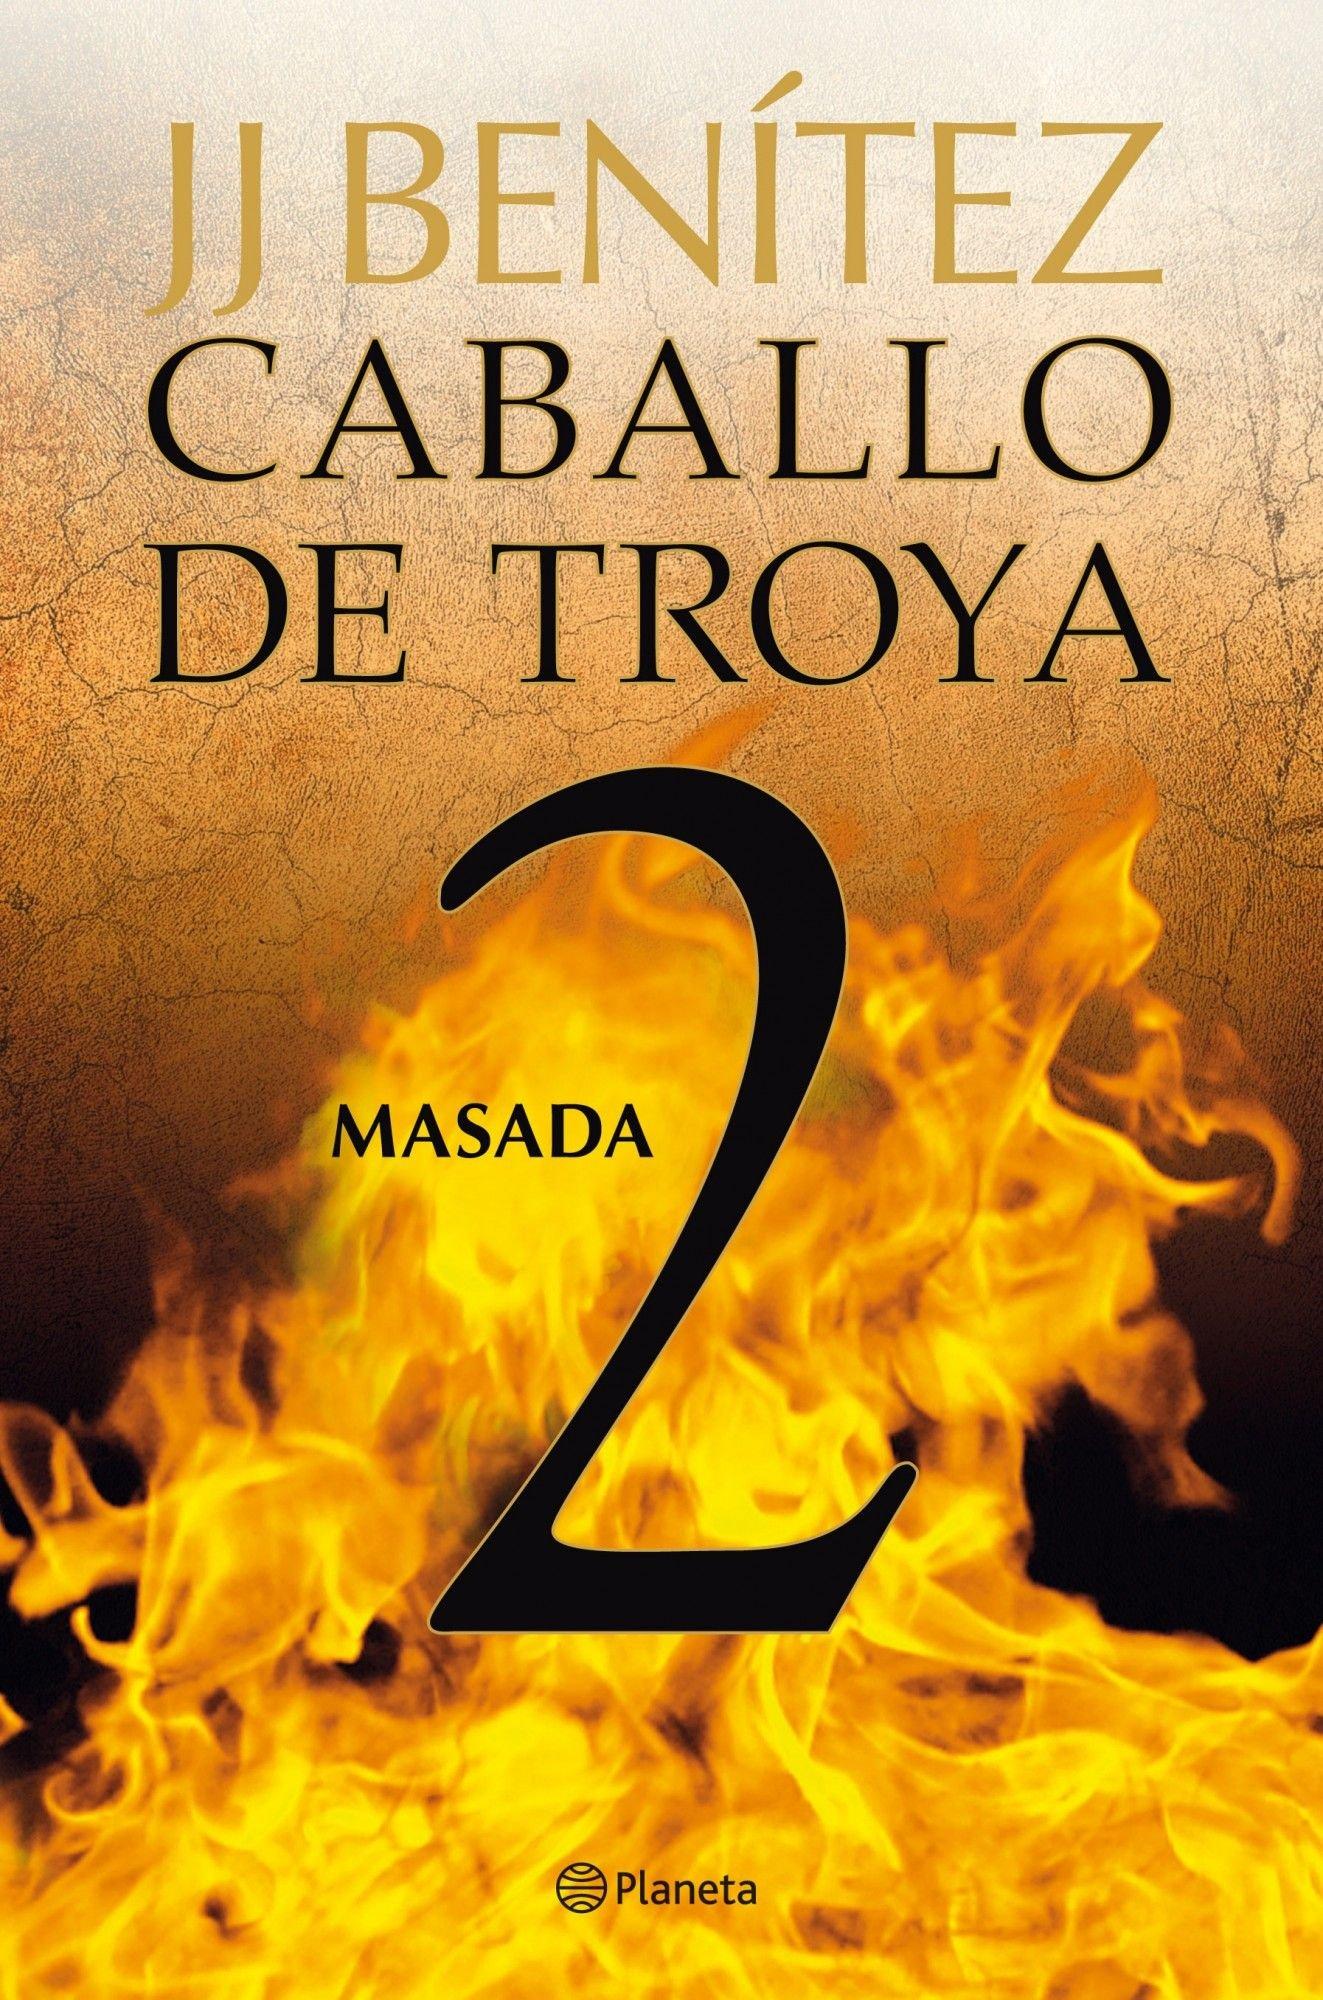 Caballo de Troya 02: Masada: J. J. (1946- ) Benítez: Amazon.com.mx: Libros